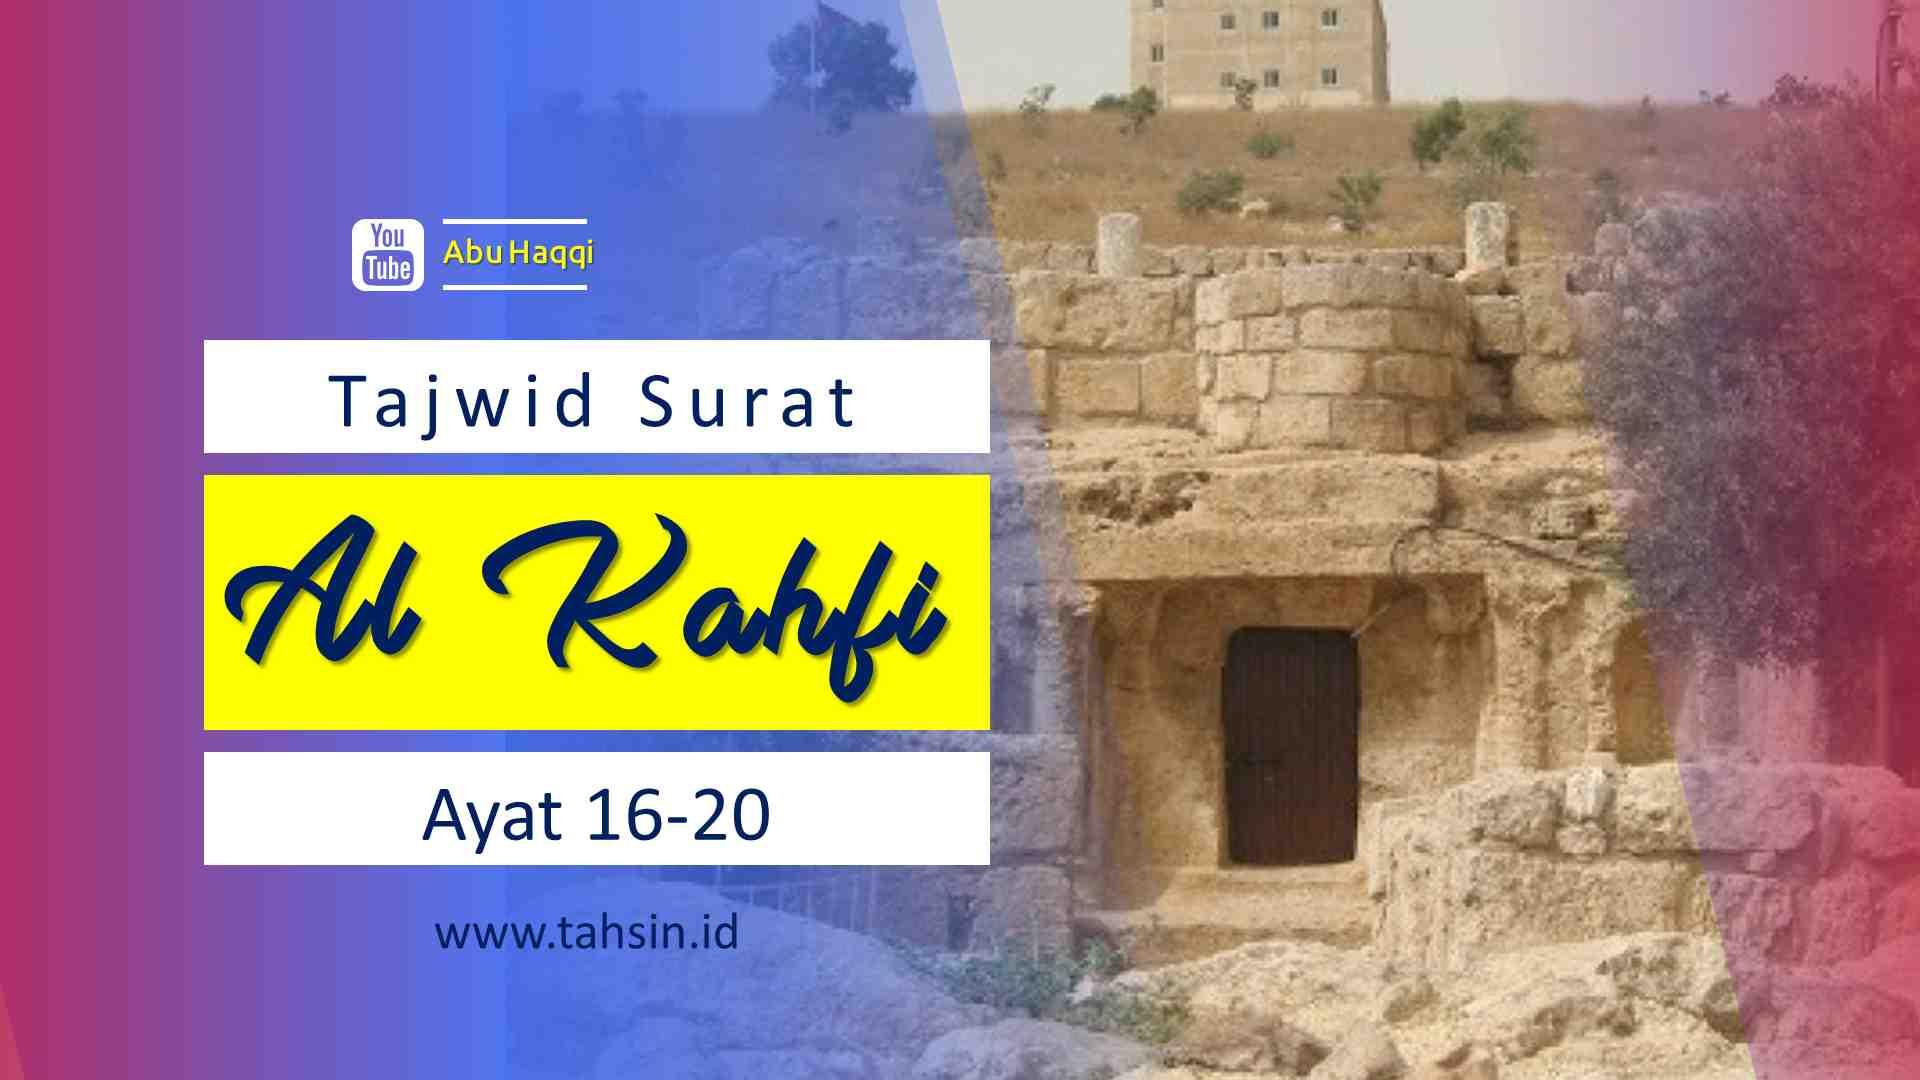 Tajwid surat Al Kahfi ayat 16-20